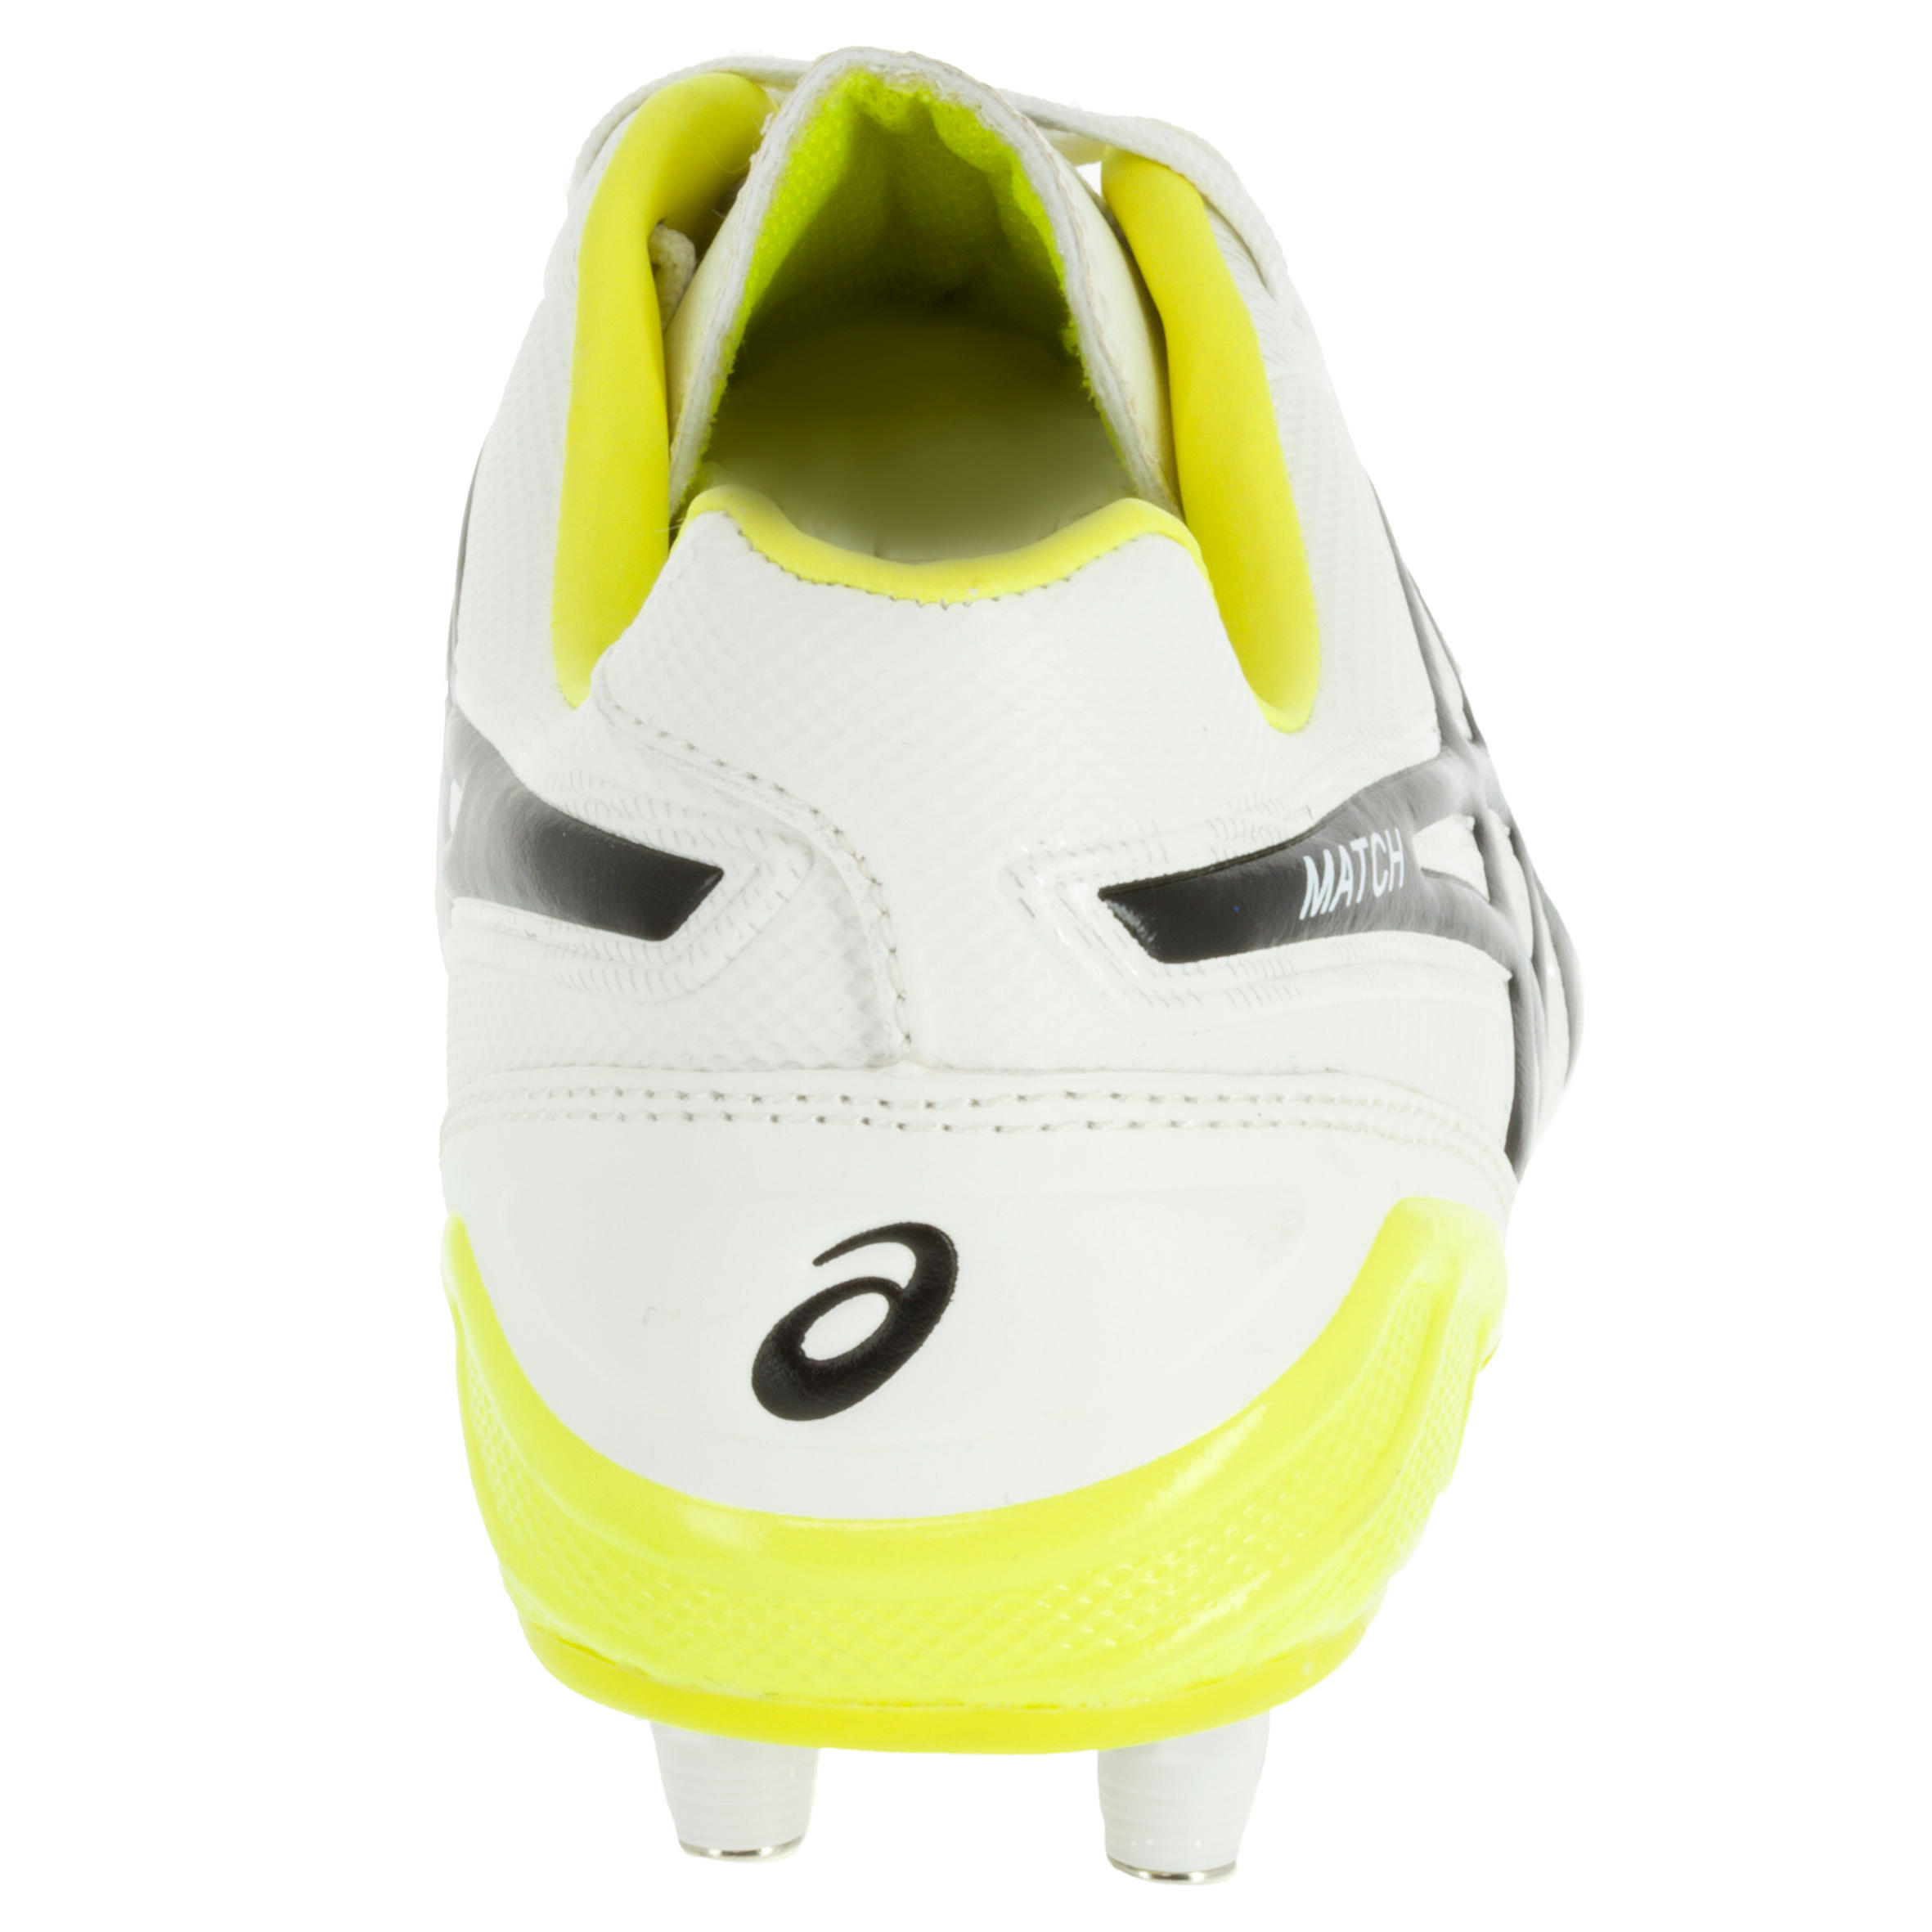 Sg De Asics Match Chaussure 6 Crampons Rugby Adulte Blancnoir FlJTK1c